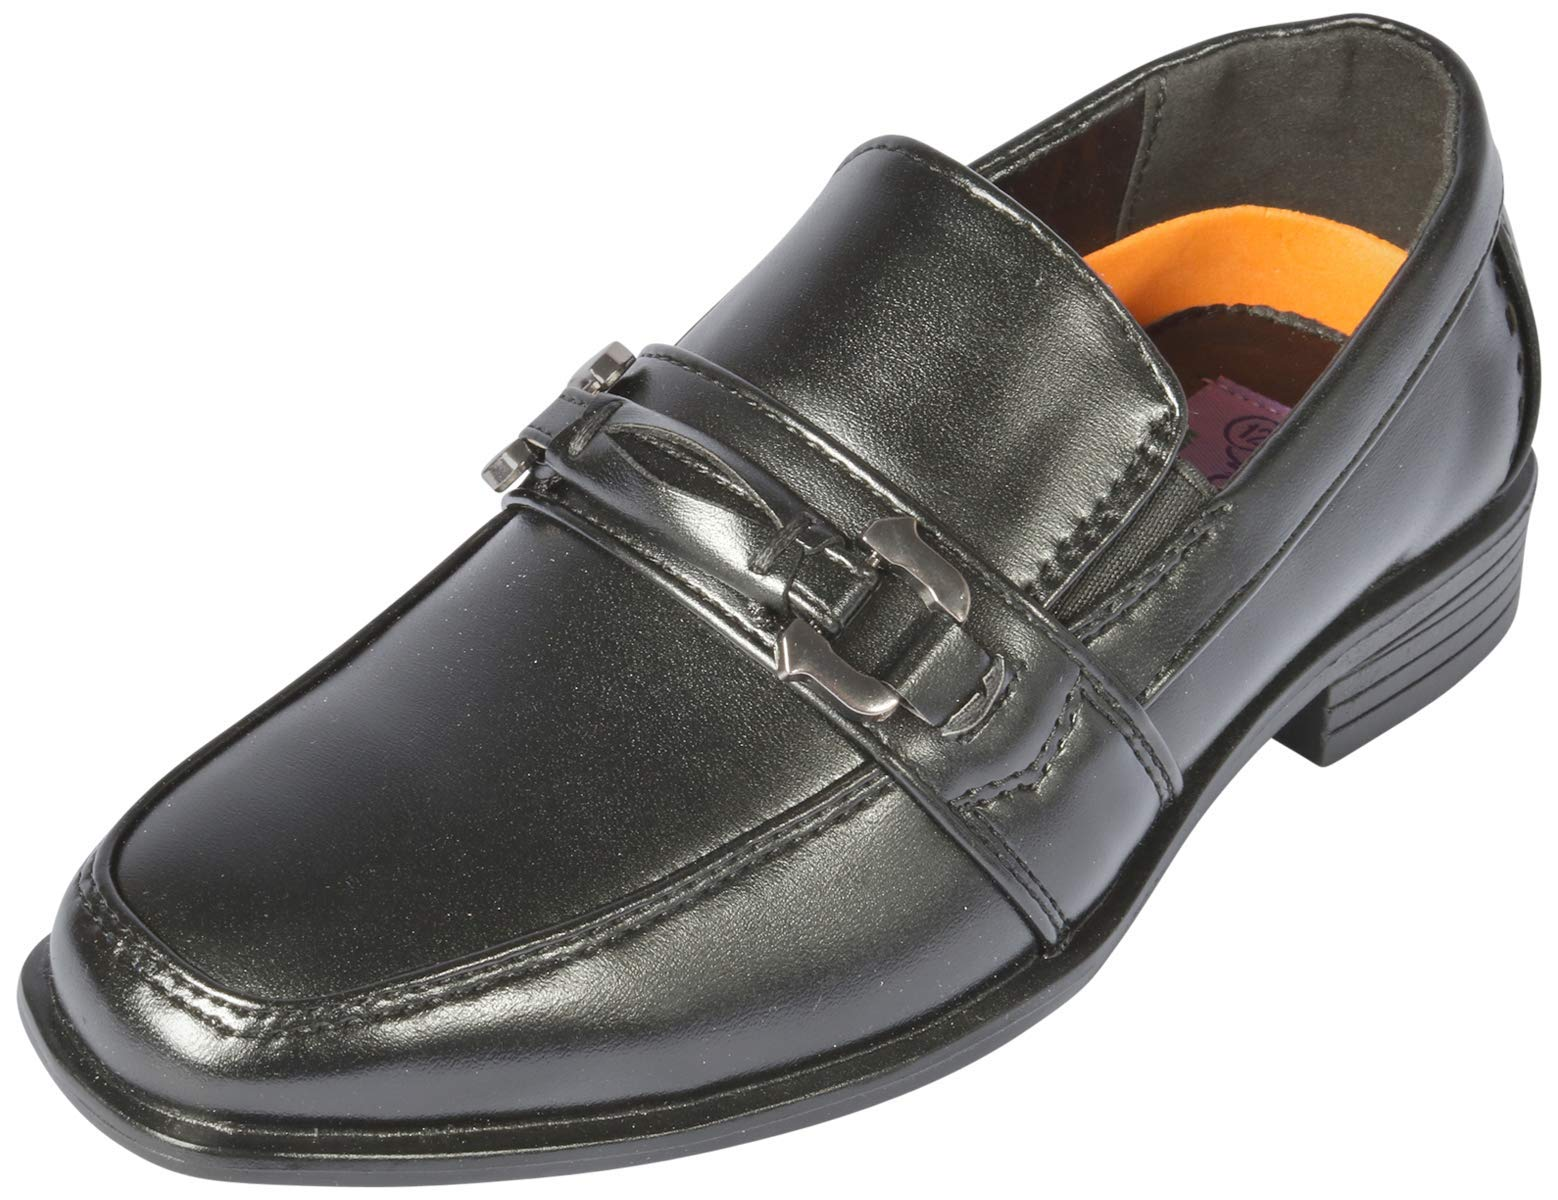 Jodano Collection Boys Memory Foam Slip On Dress Shoe, Black, 8 M US Toddler'